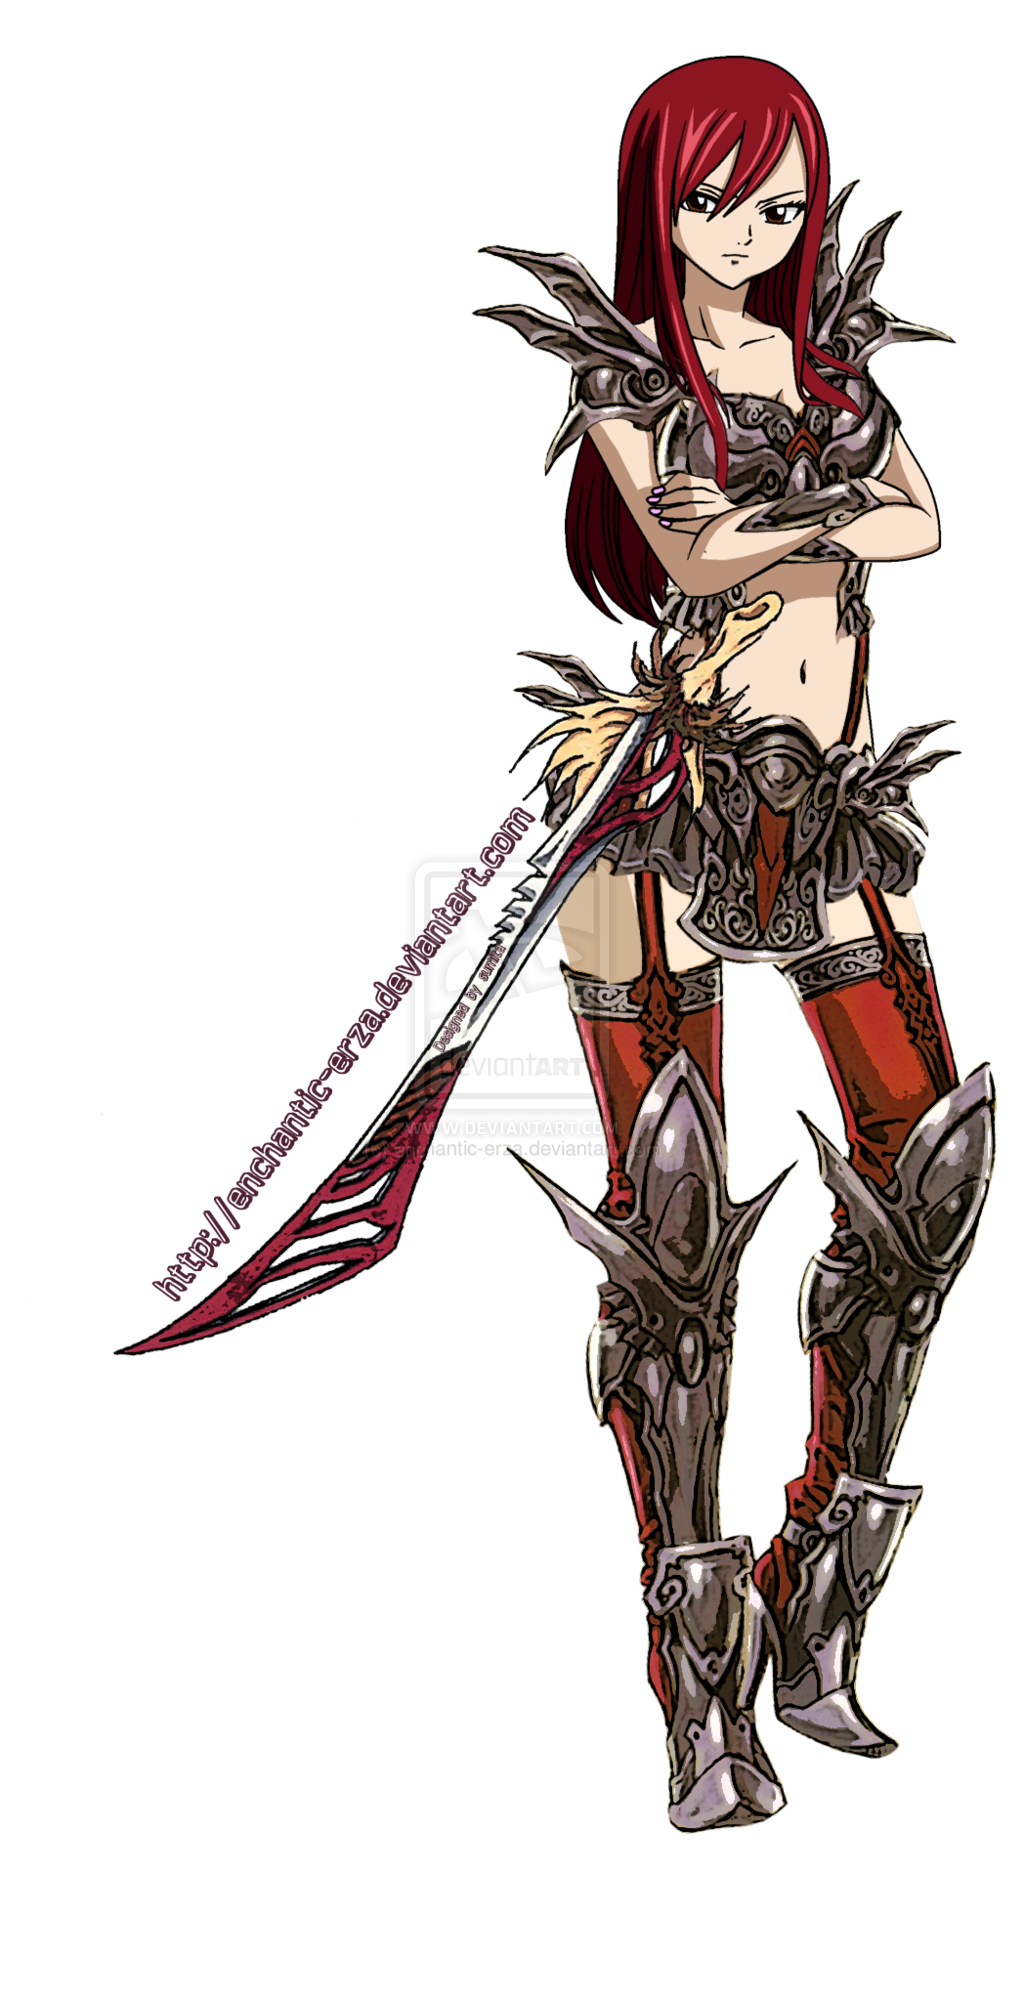 Fairy Tail Erza Scarlet Armor Erza Scarlet Demonite Armor By